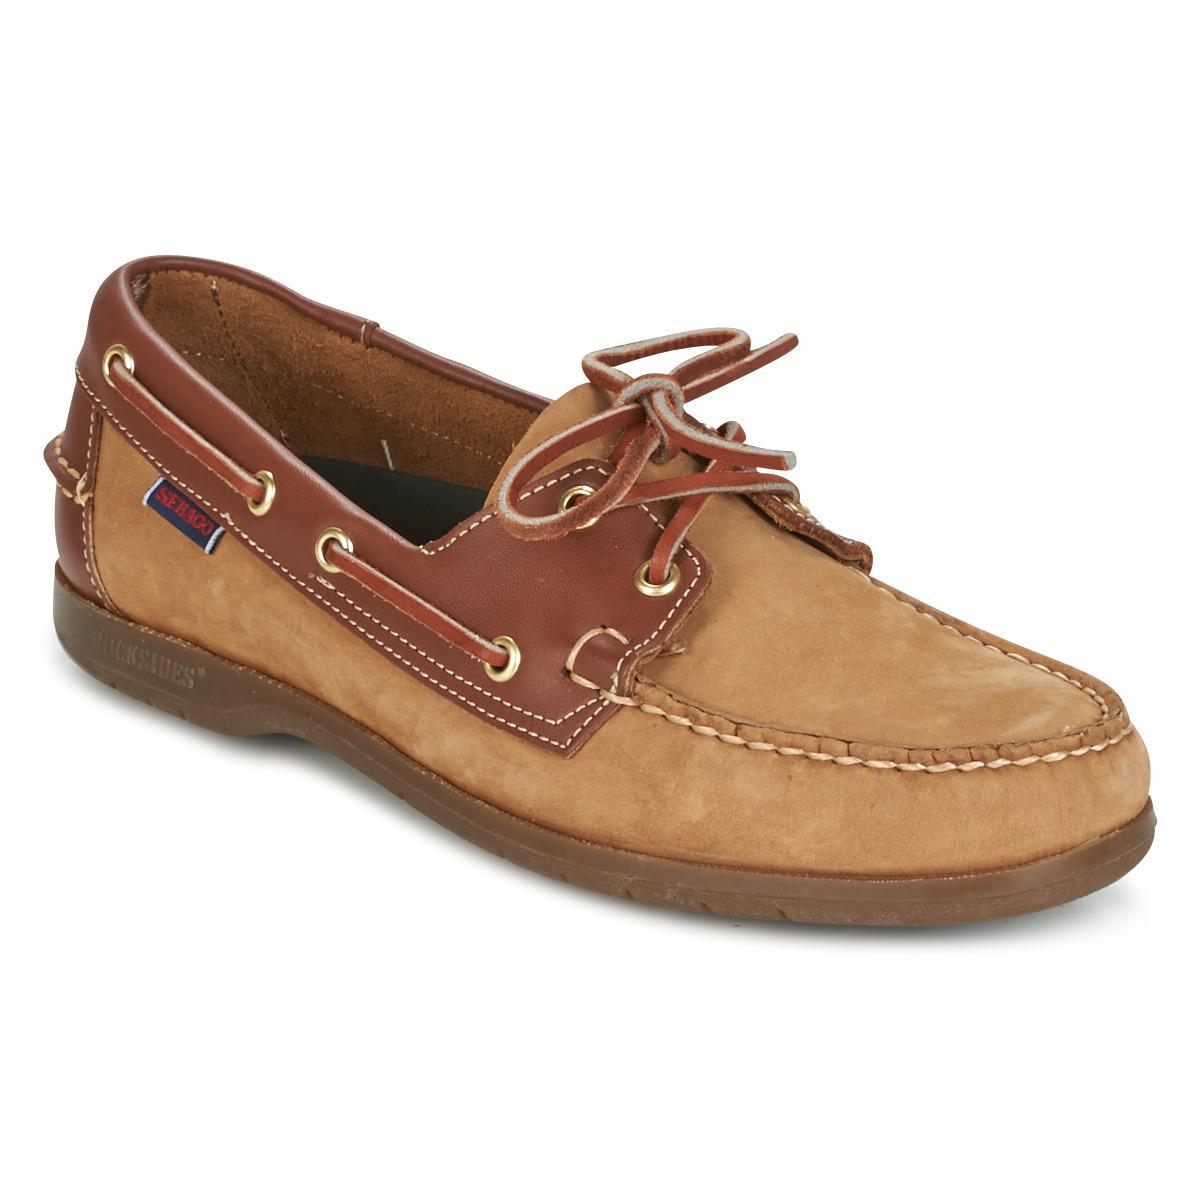 Endeavor, Mens Boat Shoes Sebago